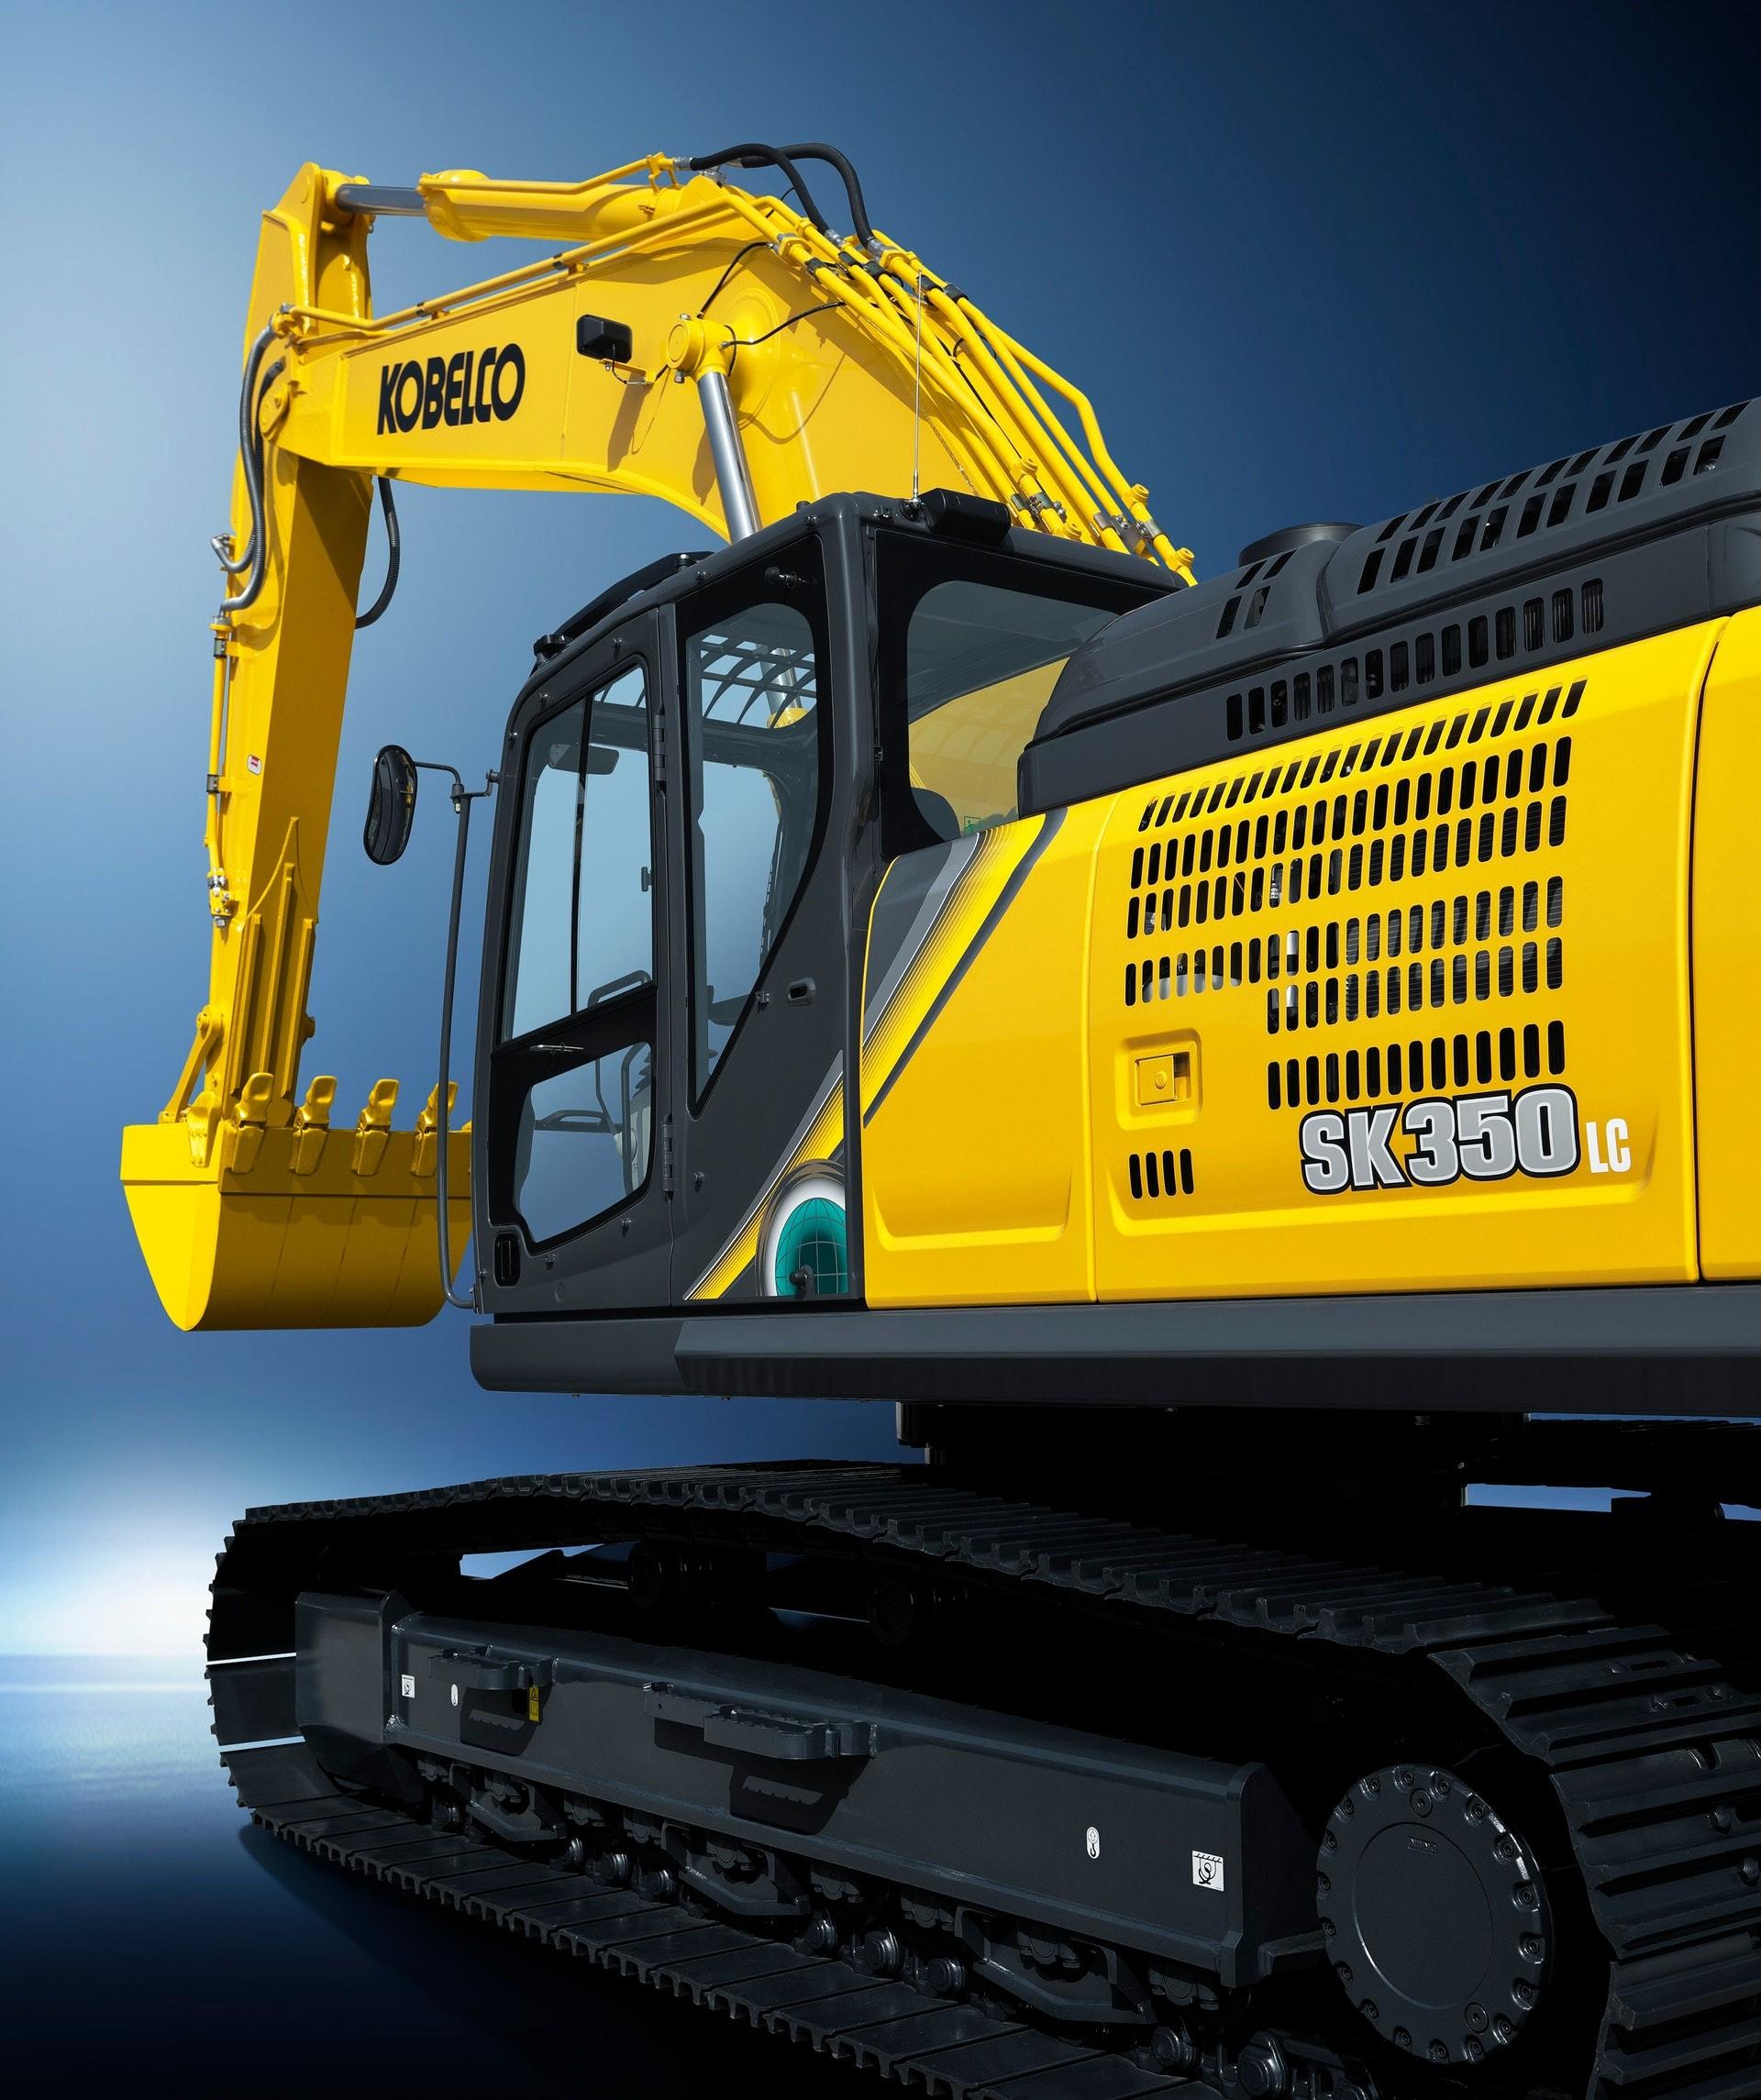 Kobelco torq Convertor Kobelco Sk350lc 10 Excavator From Kobelco Construction Of Kobelco torq Convertor